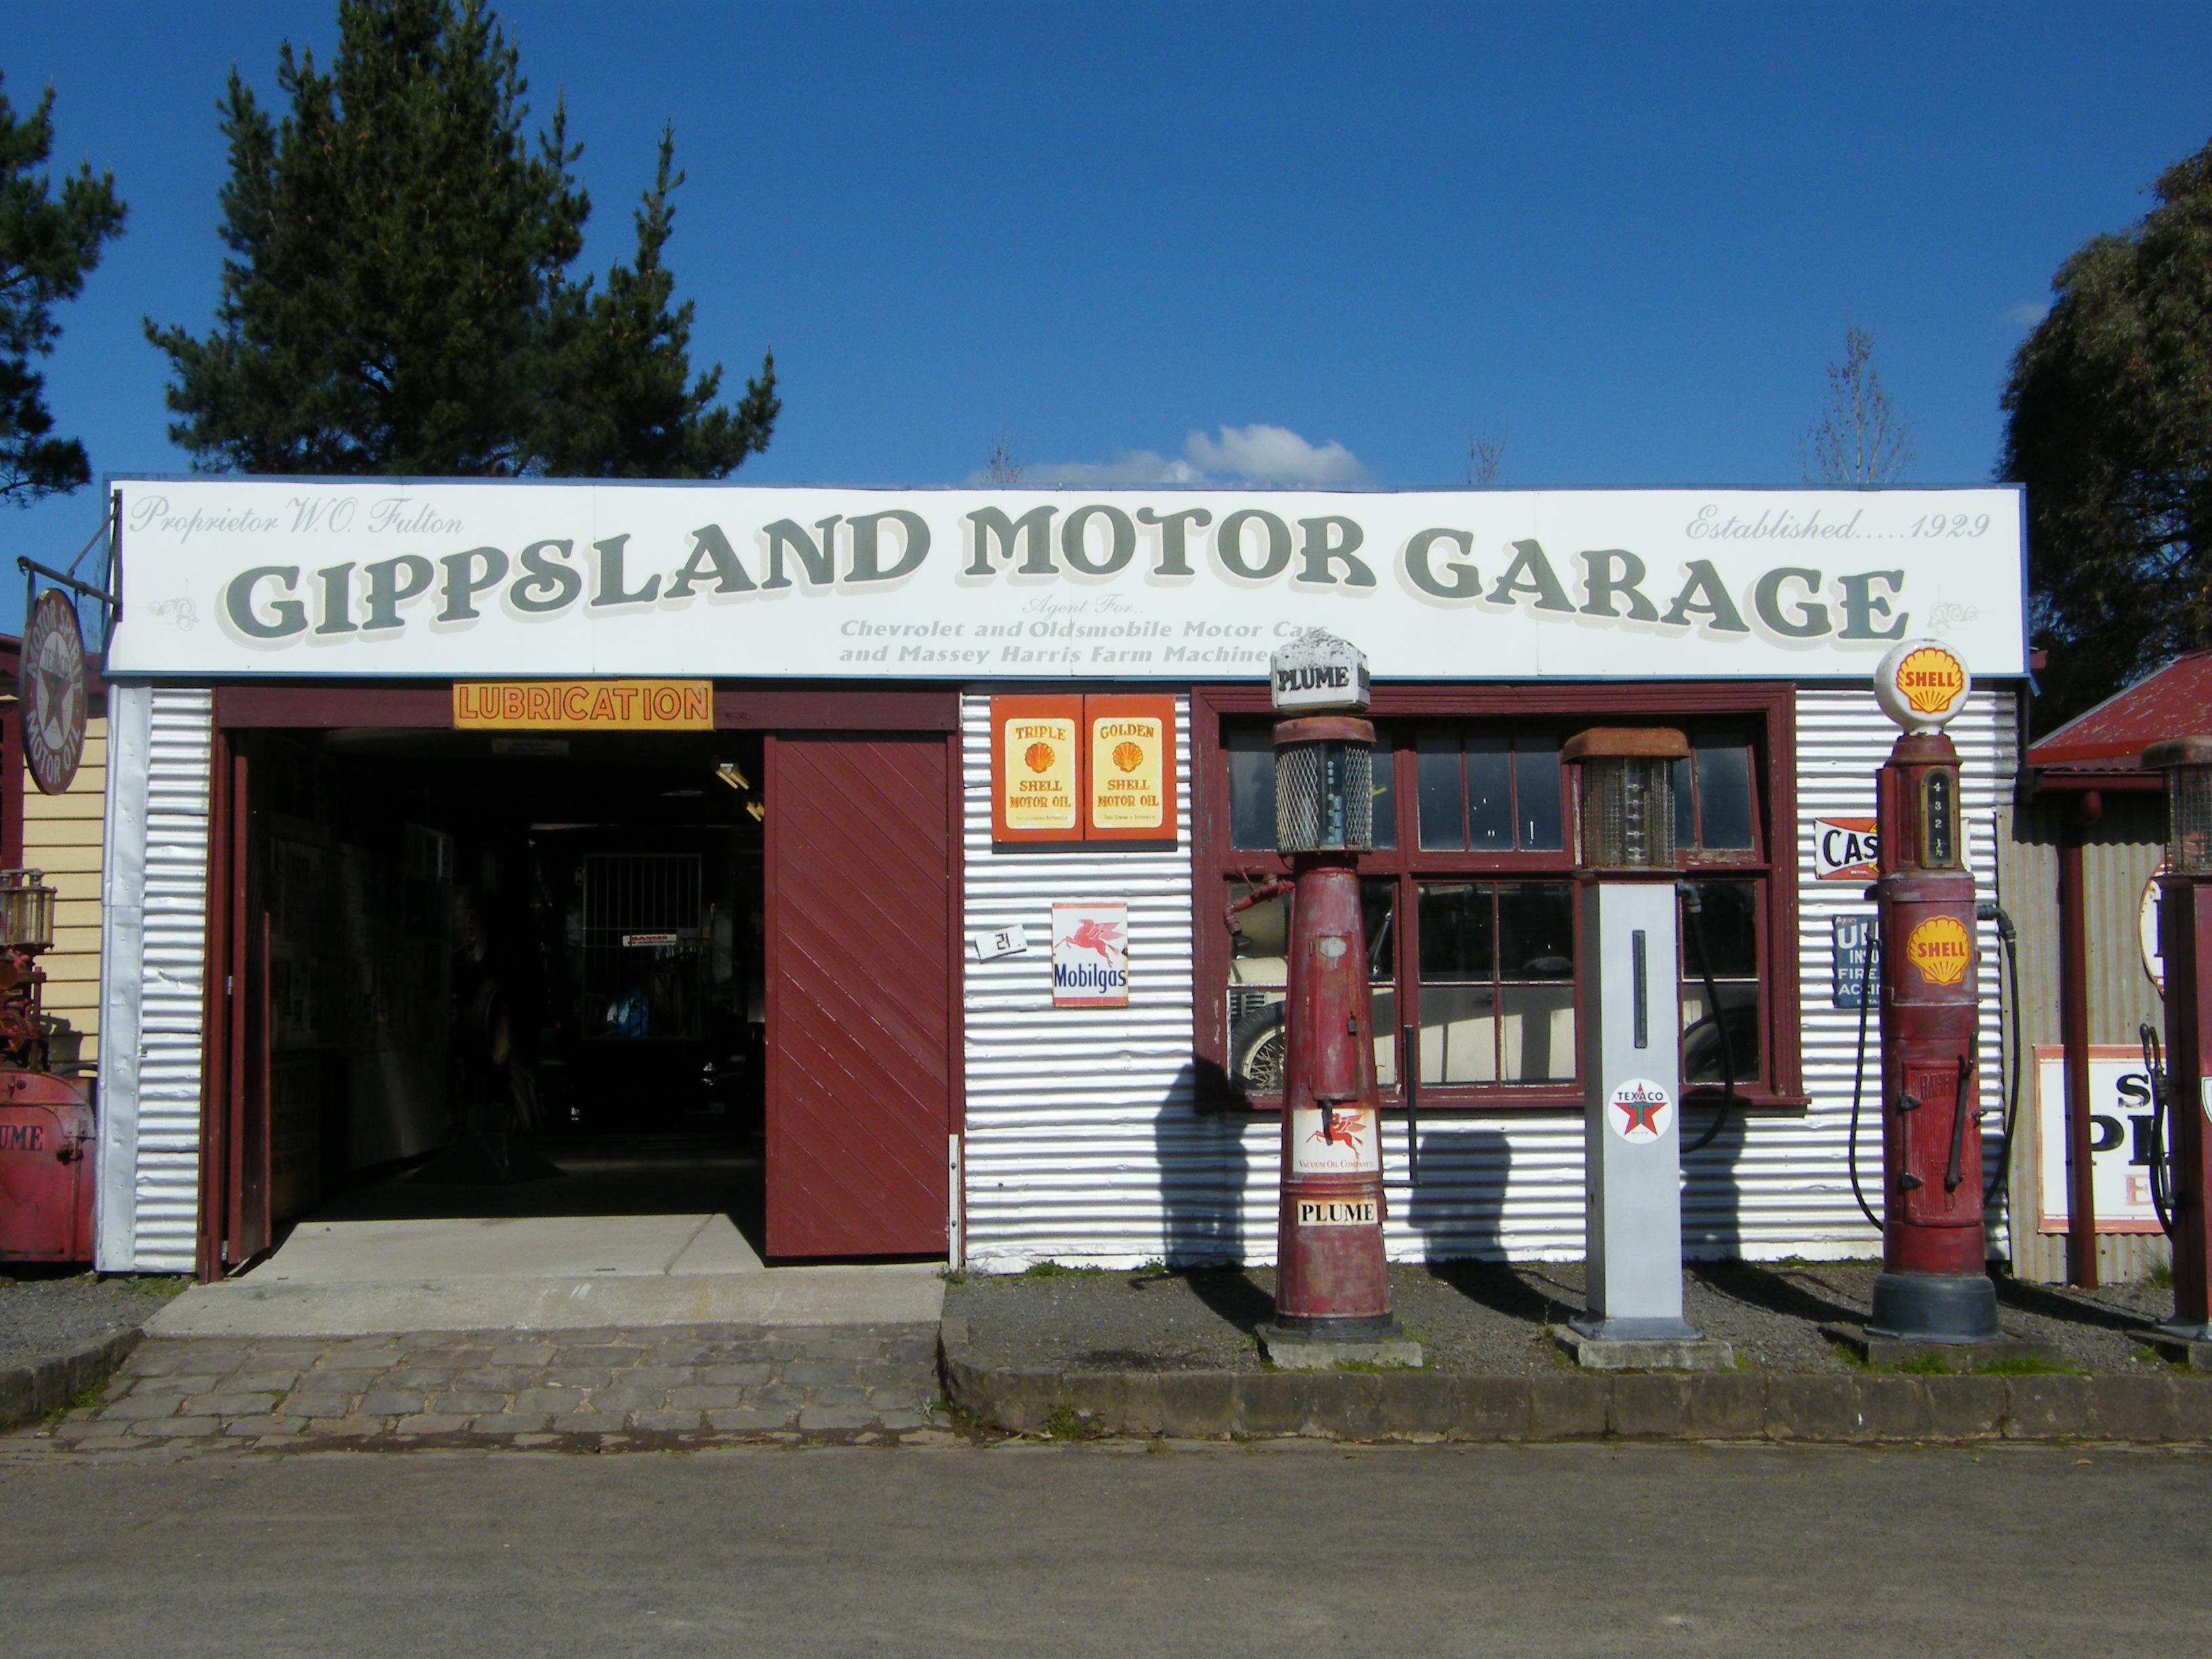 FileGippsland Motor Garage Old GippstownJPG Wikimedia